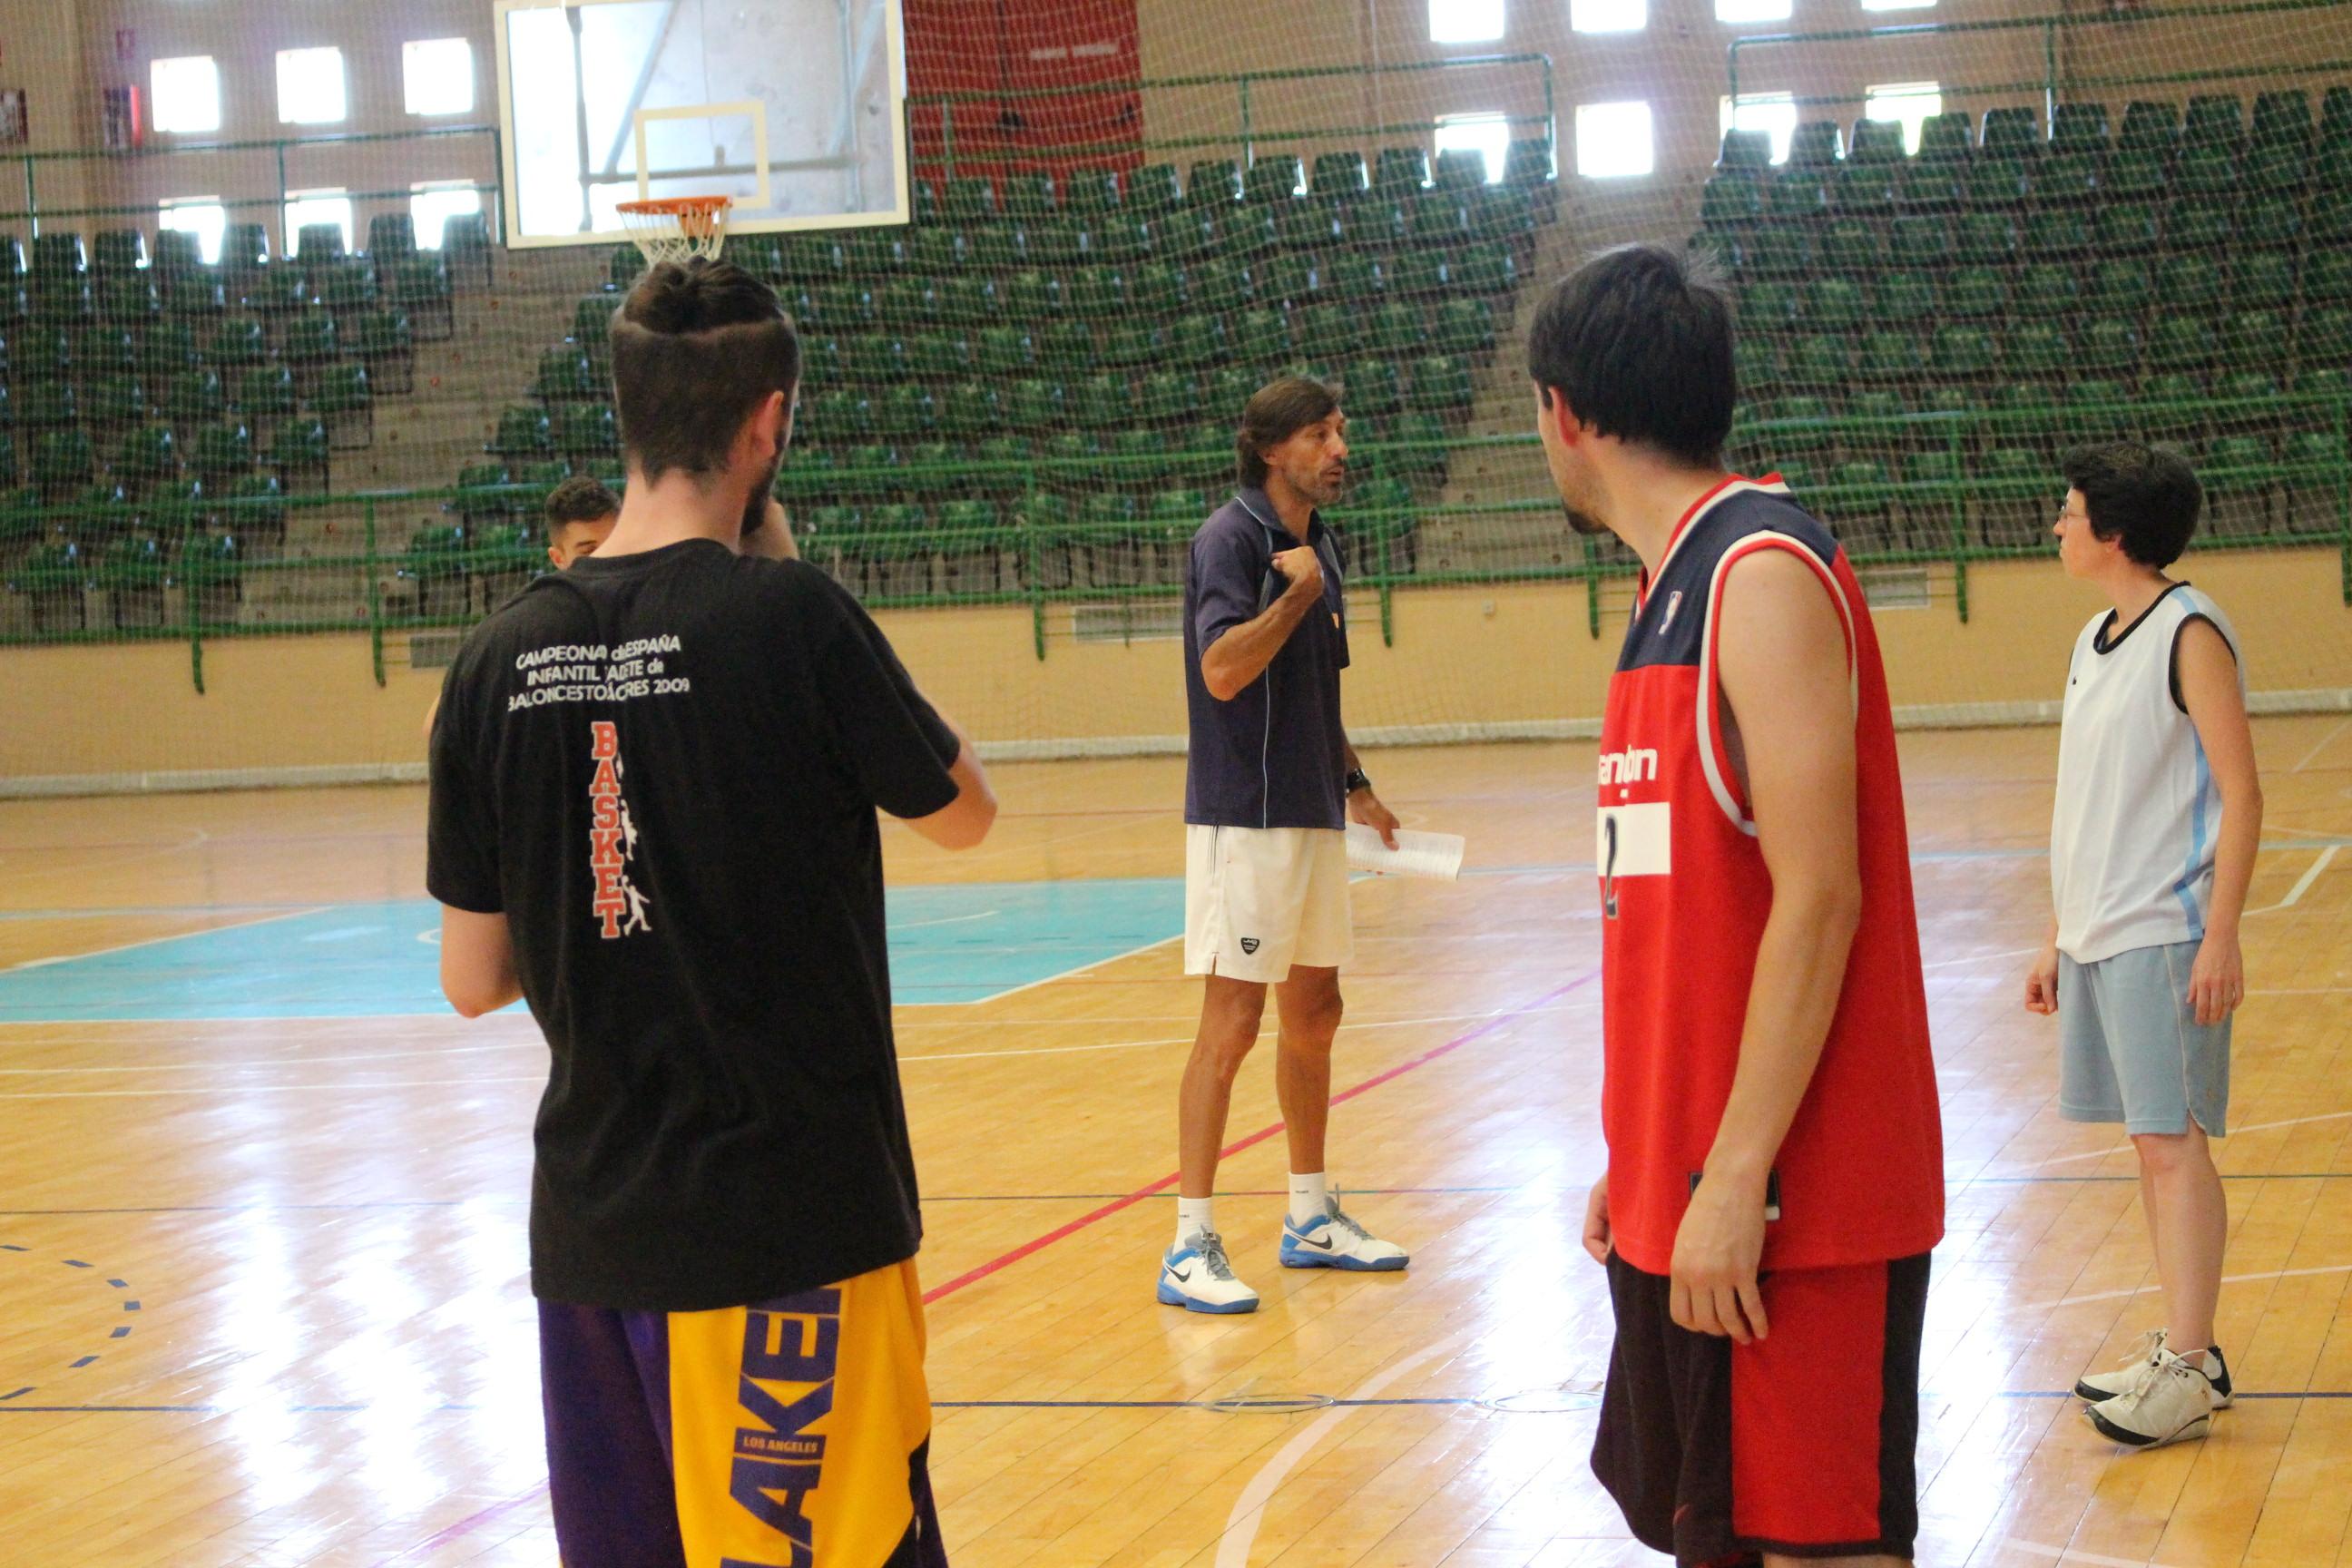 Escuela de Formación IMD: Curso de Entrenador de Baloncesto de Iniciación-Nivel 0